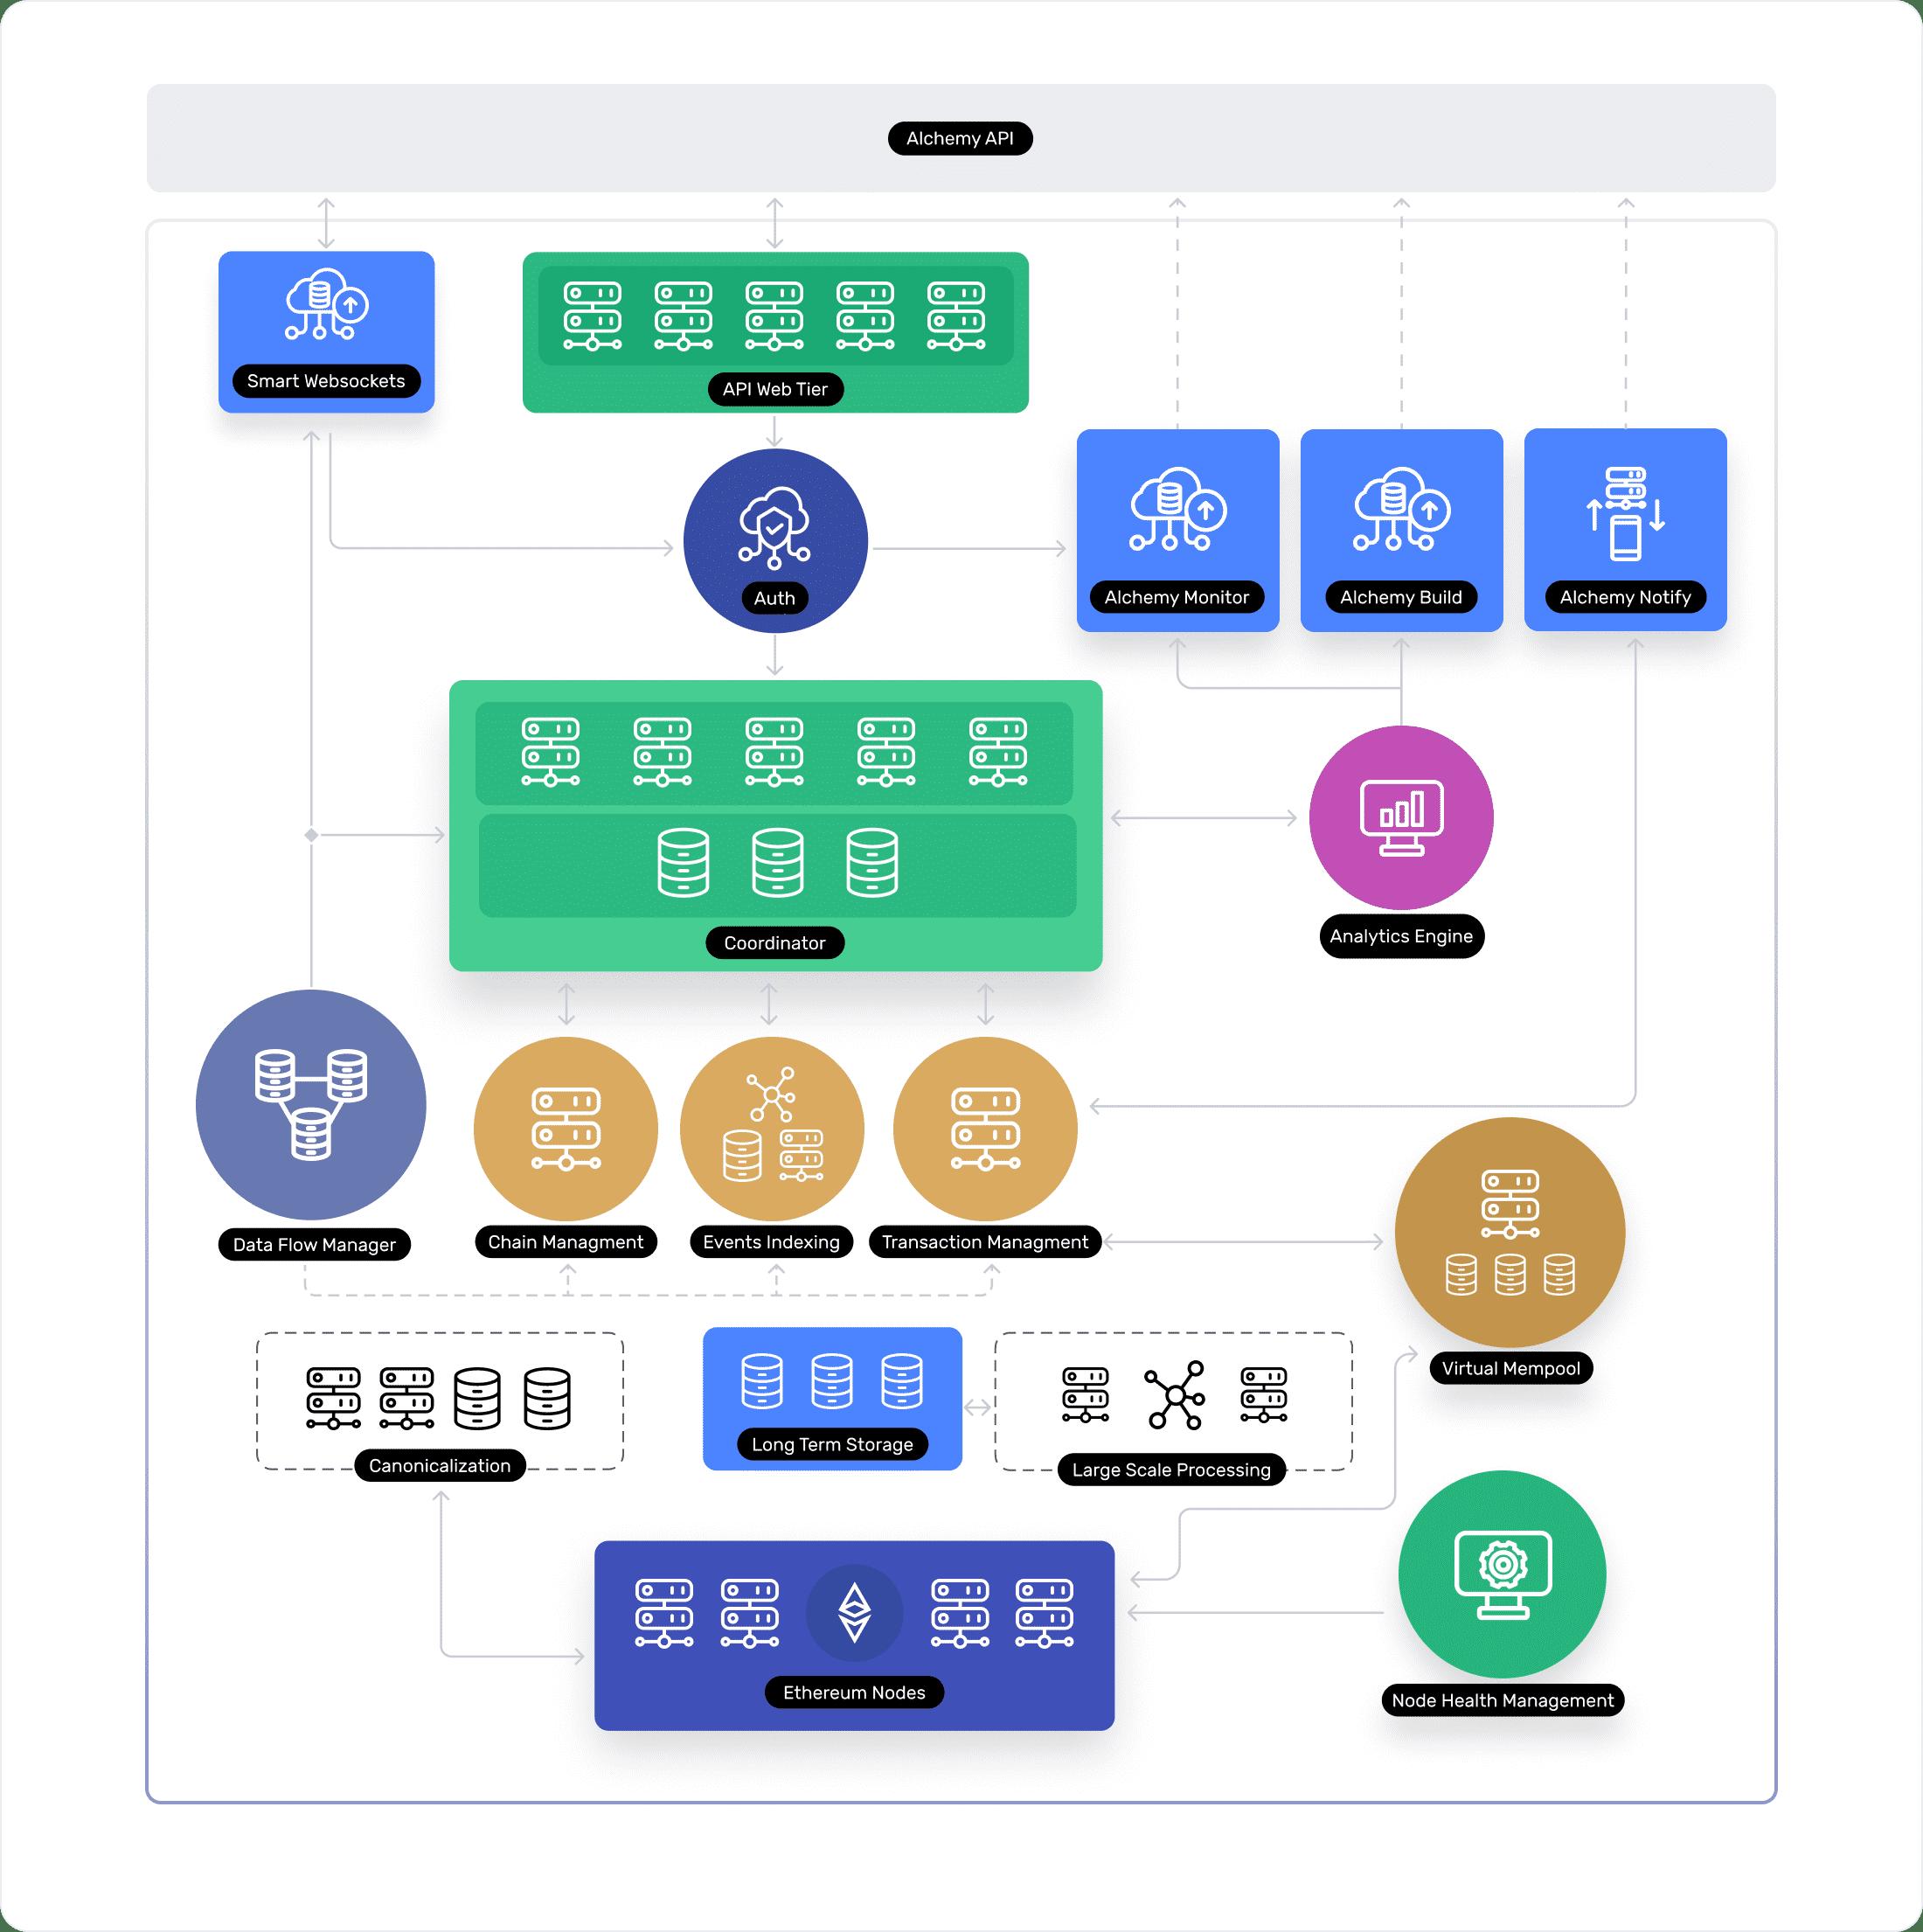 Supernode infrastructure diagram